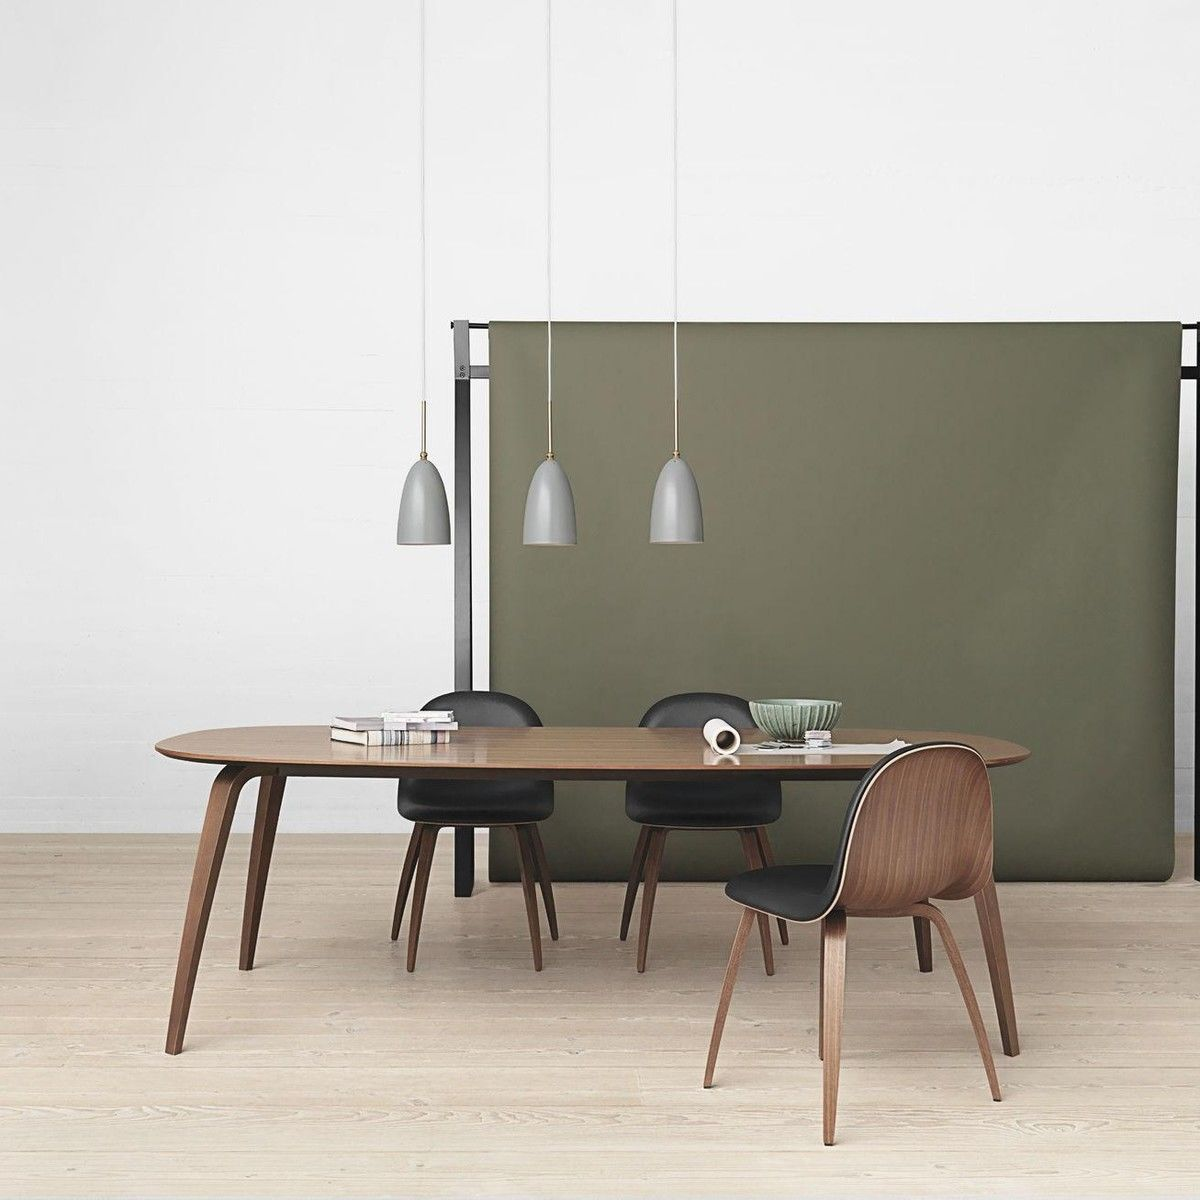 gubi chair 5 chaise avec pi tement en bois gubi. Black Bedroom Furniture Sets. Home Design Ideas